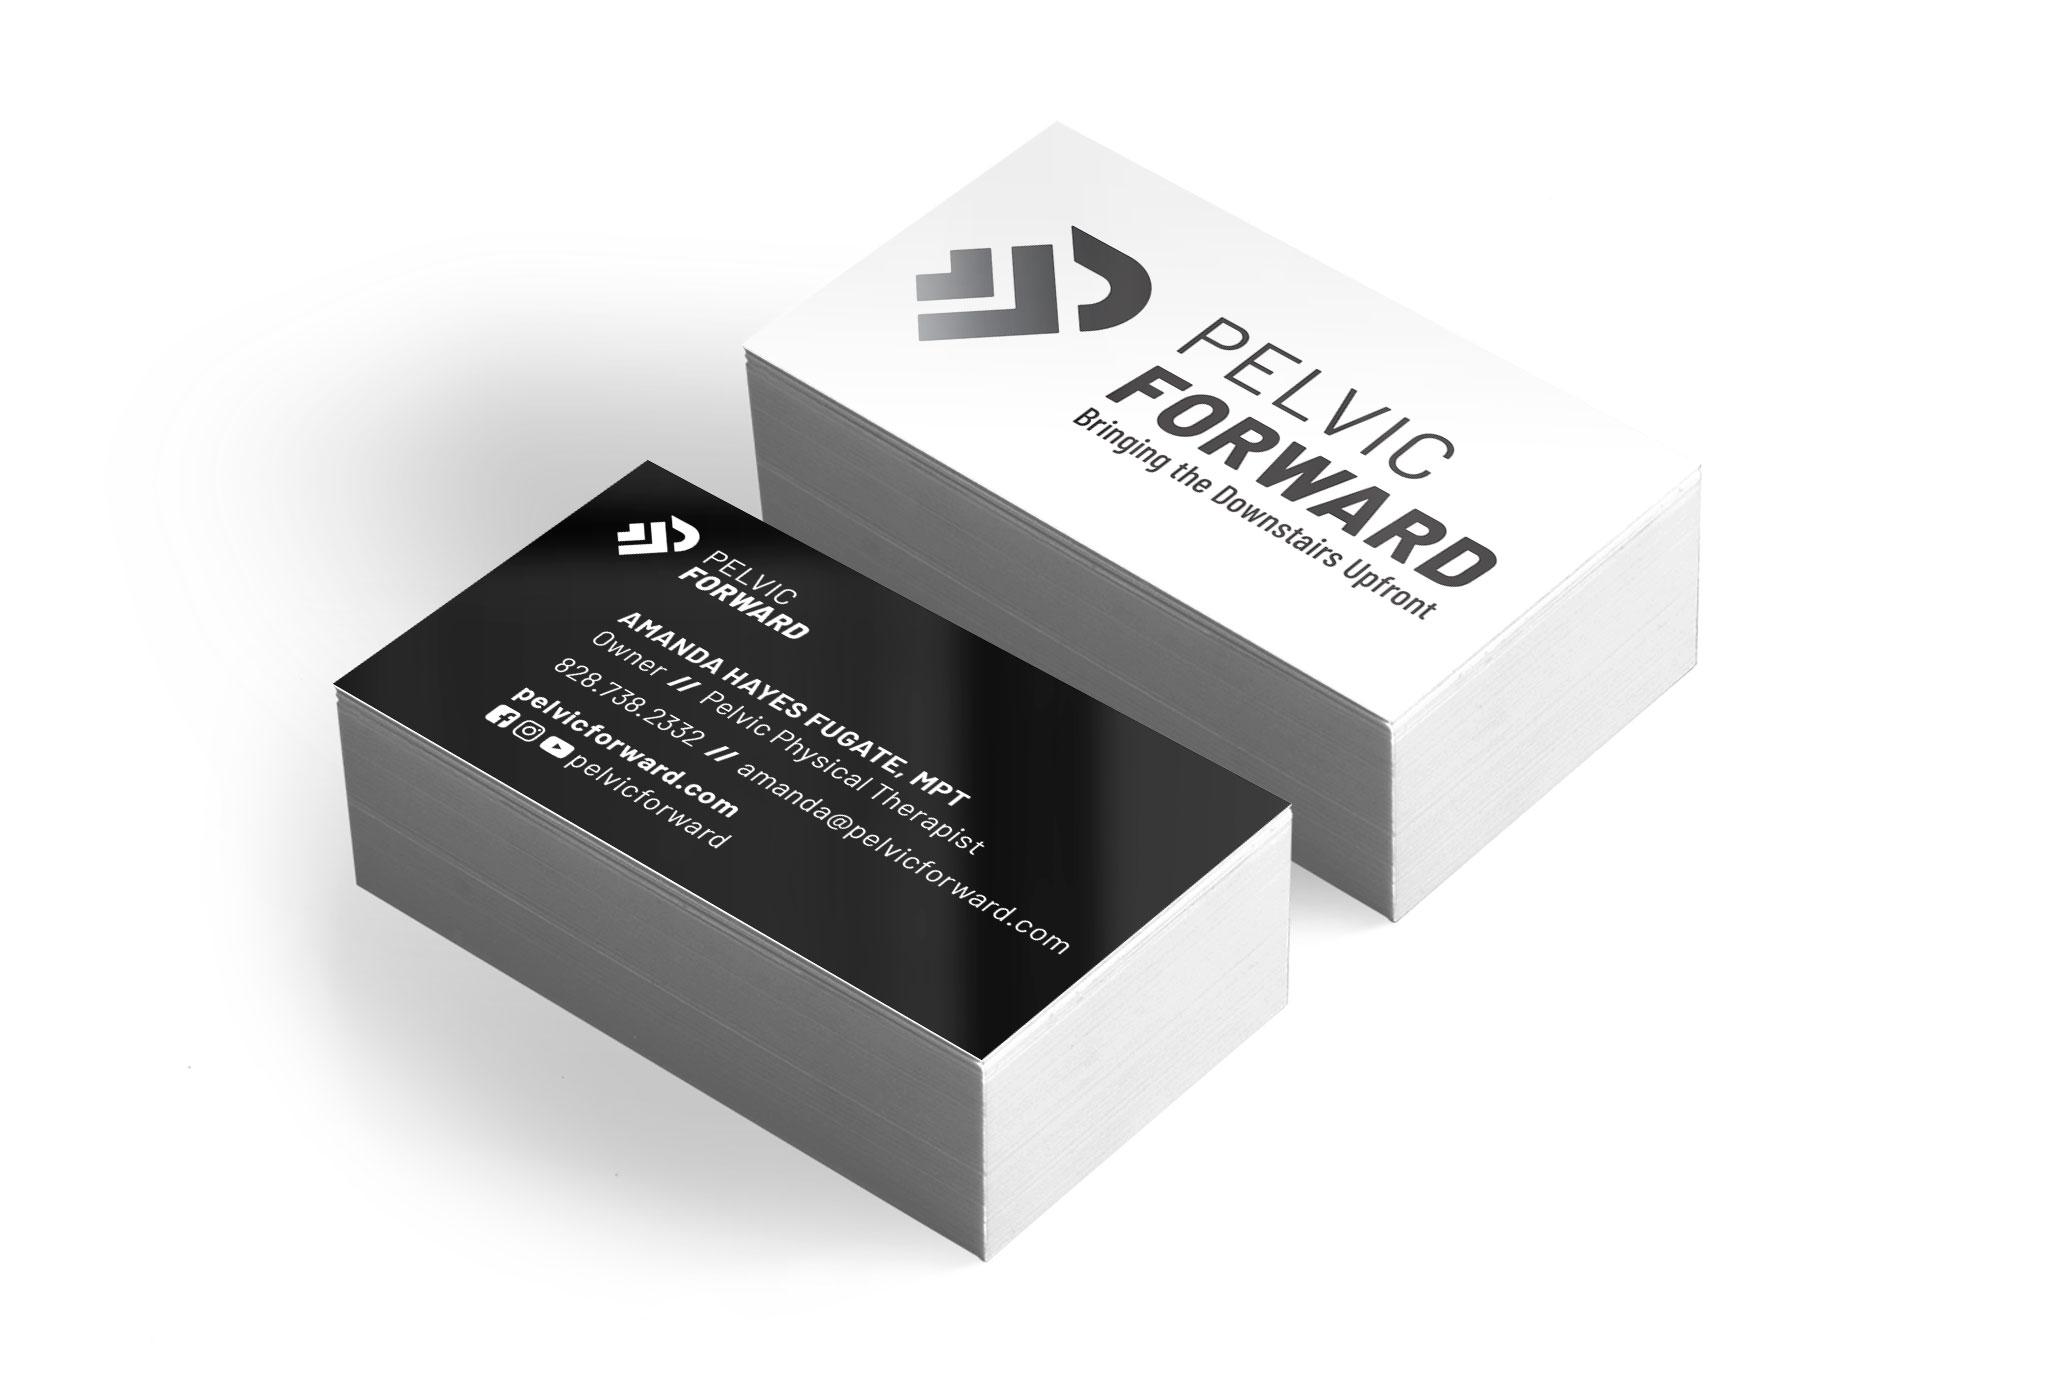 Pelvic Forward's business card design